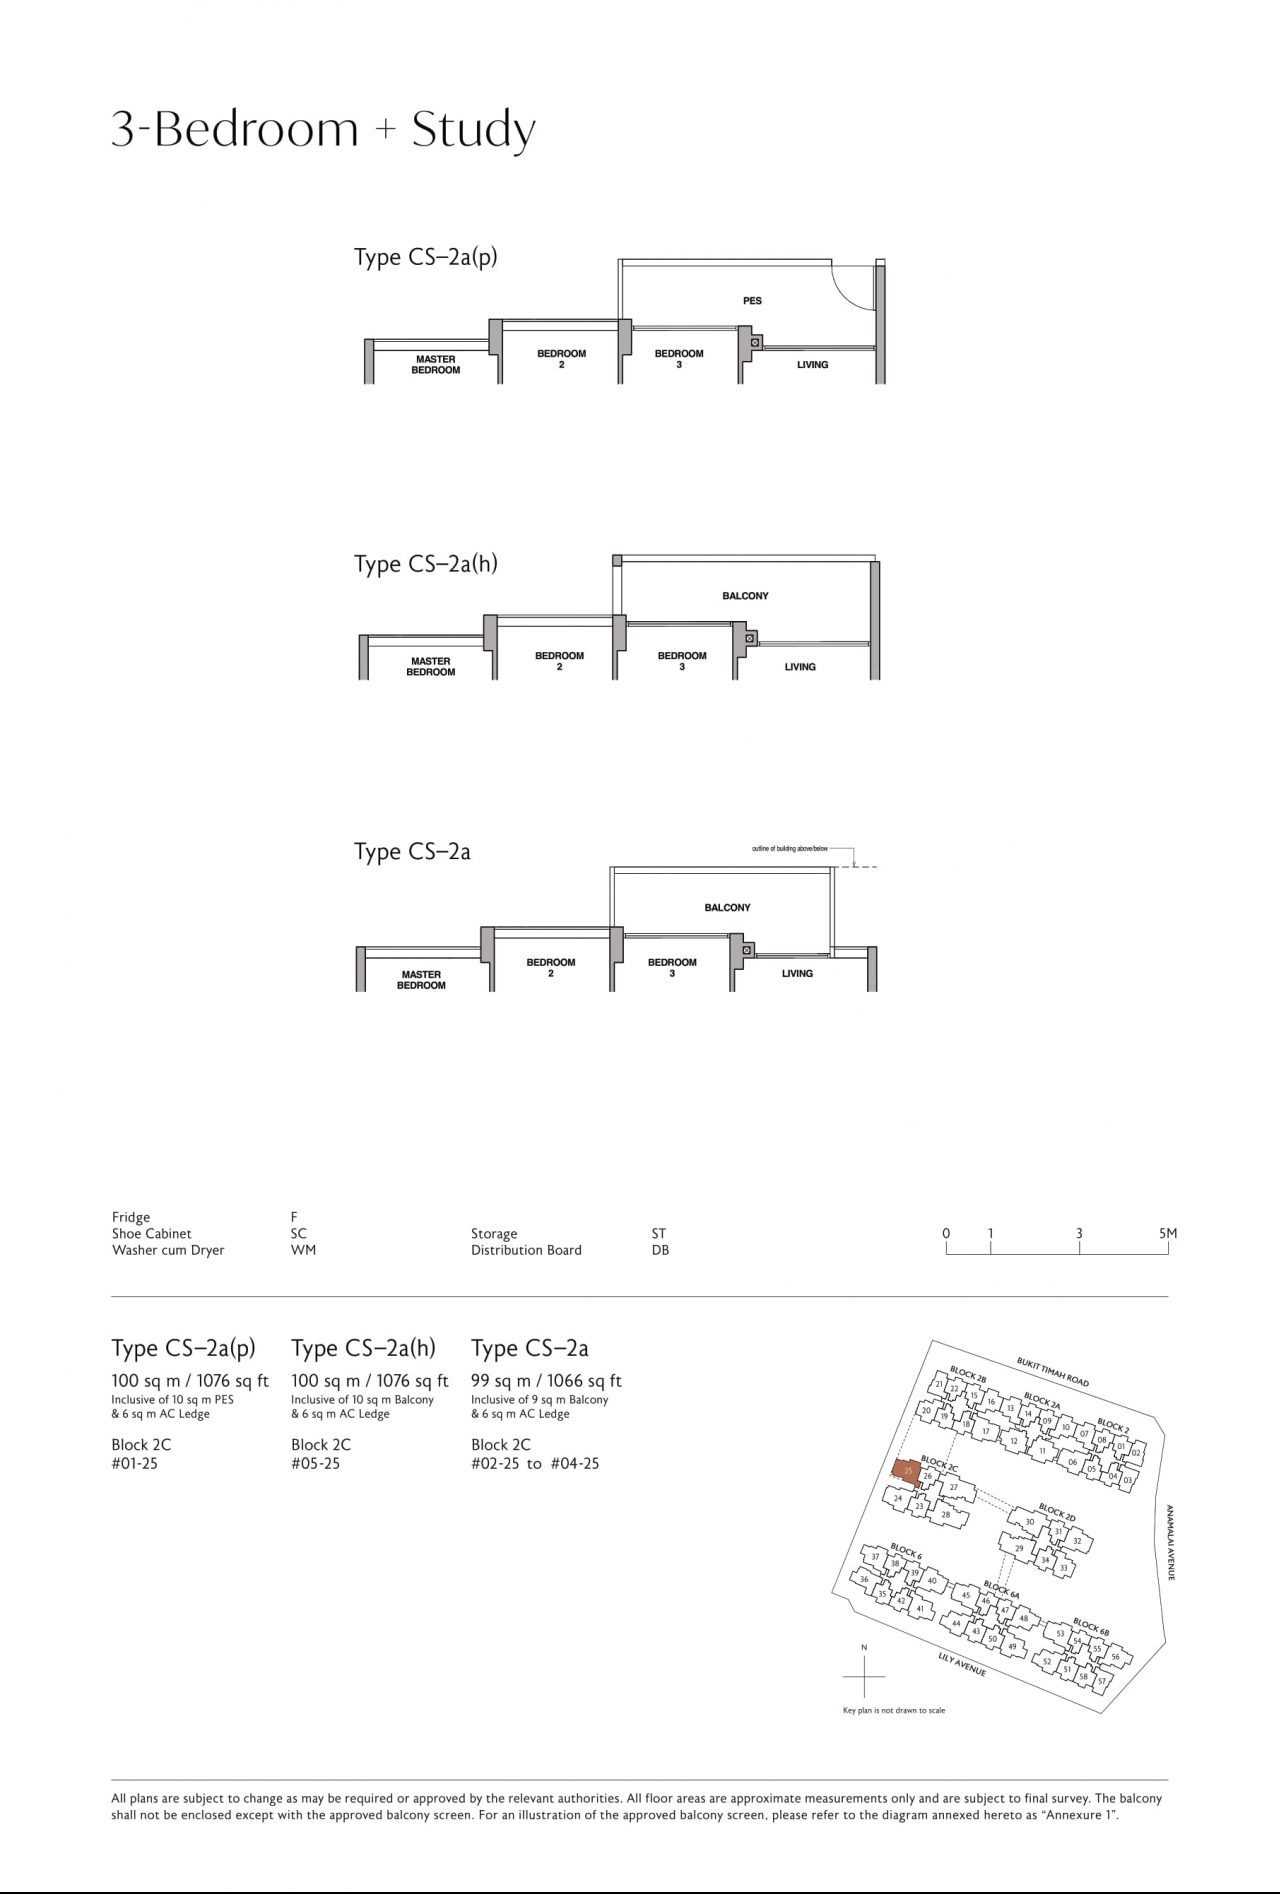 Royalgreen's three-bedroom & three-bedroom + study types